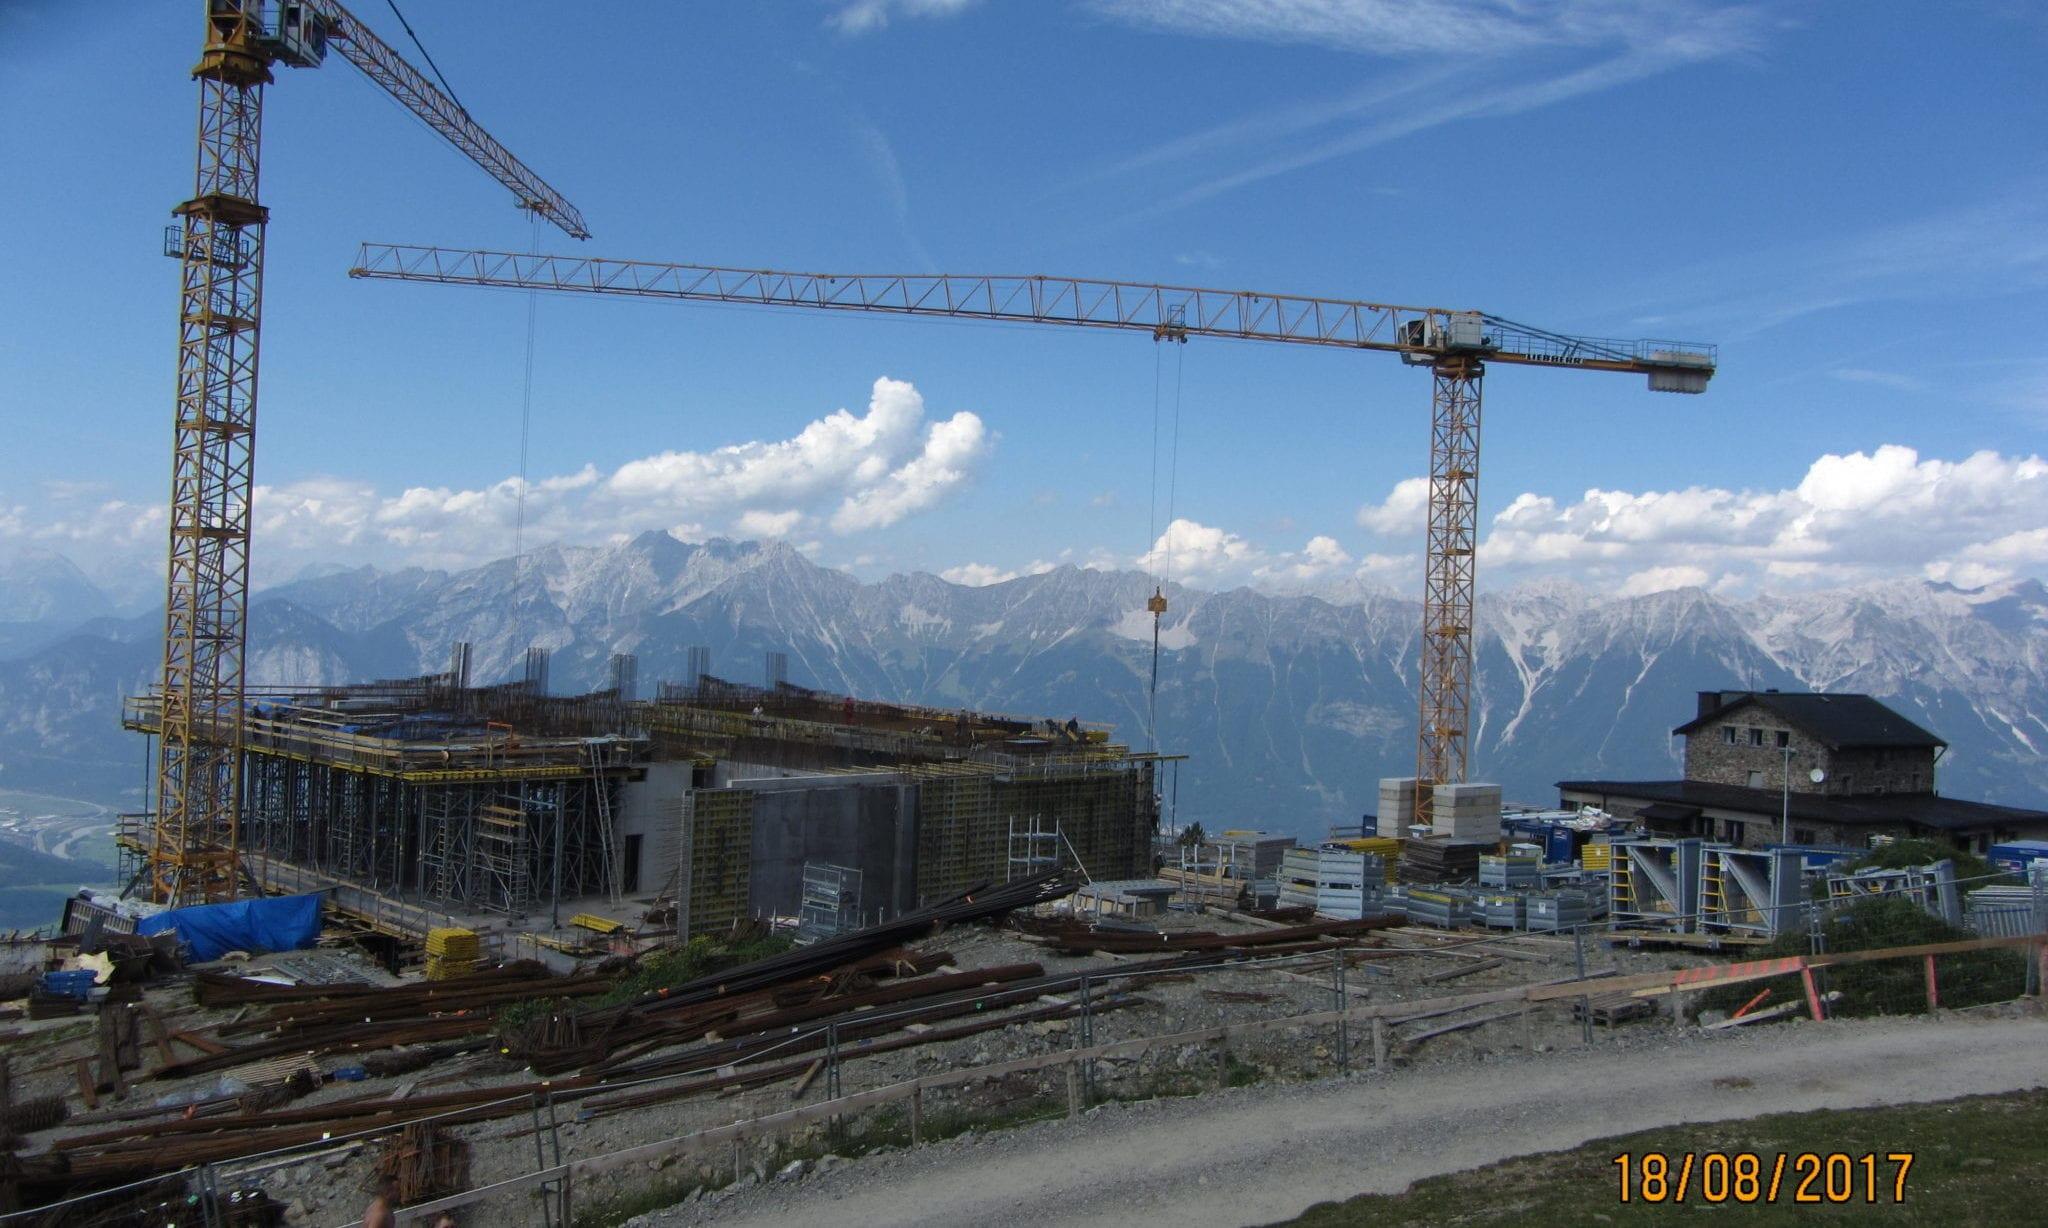 Bau-Skandal: Innsbrucks Vizebürgermeisterin Oppitz-Plörer vor Amtsenthebung inklusive Neuwahlen?